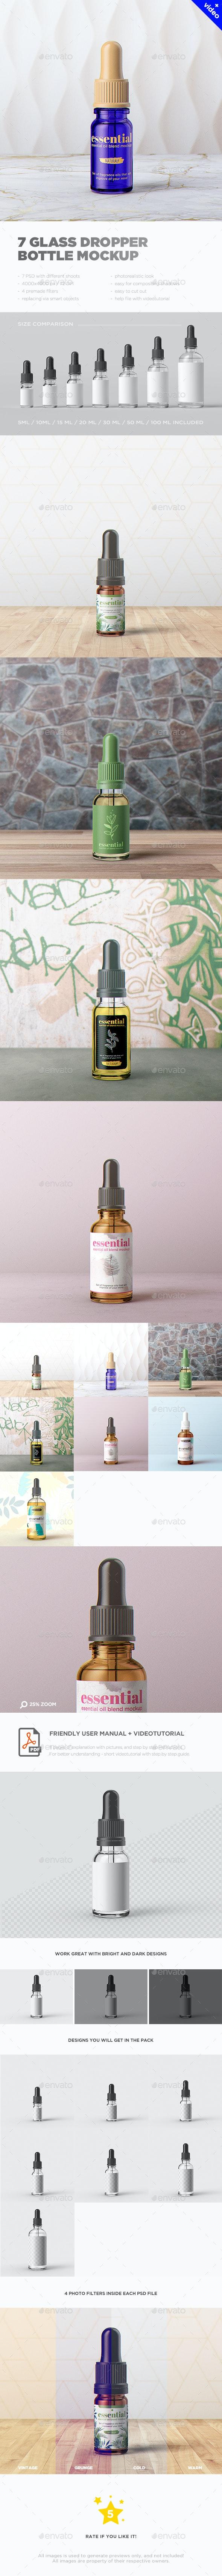 7 Glass Dropper Bottle MockUp - Miscellaneous Packaging